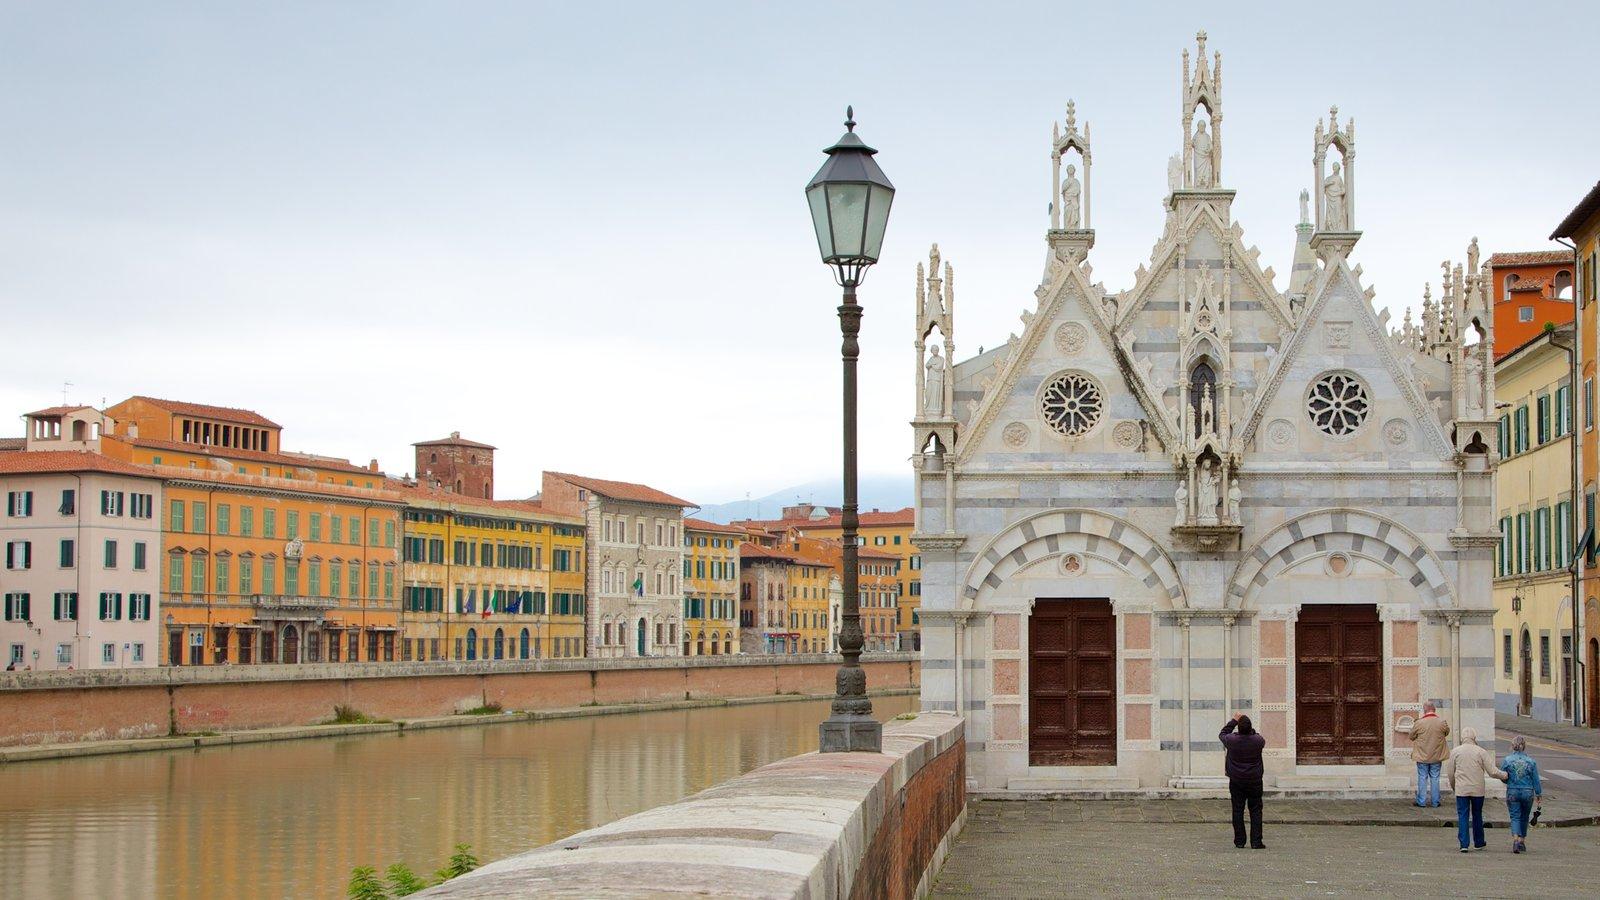 Santa Maria della Spina showing heritage architecture, a river or creek and a city